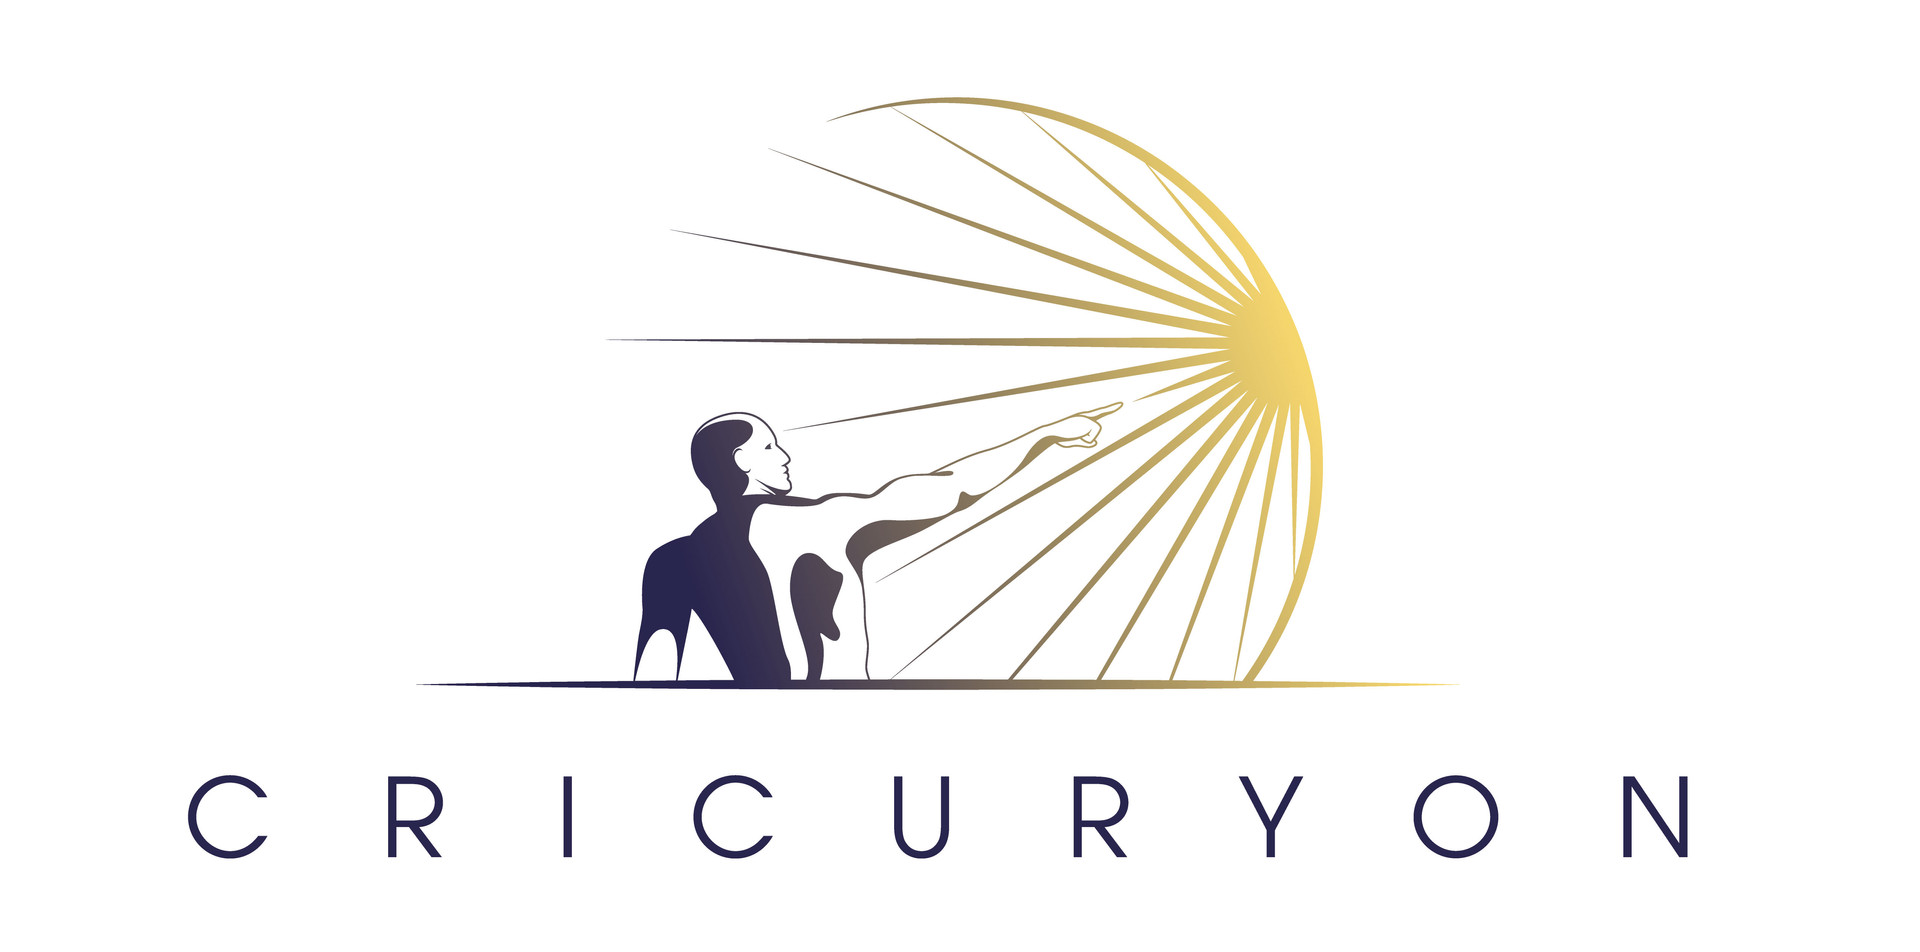 Cricuryon